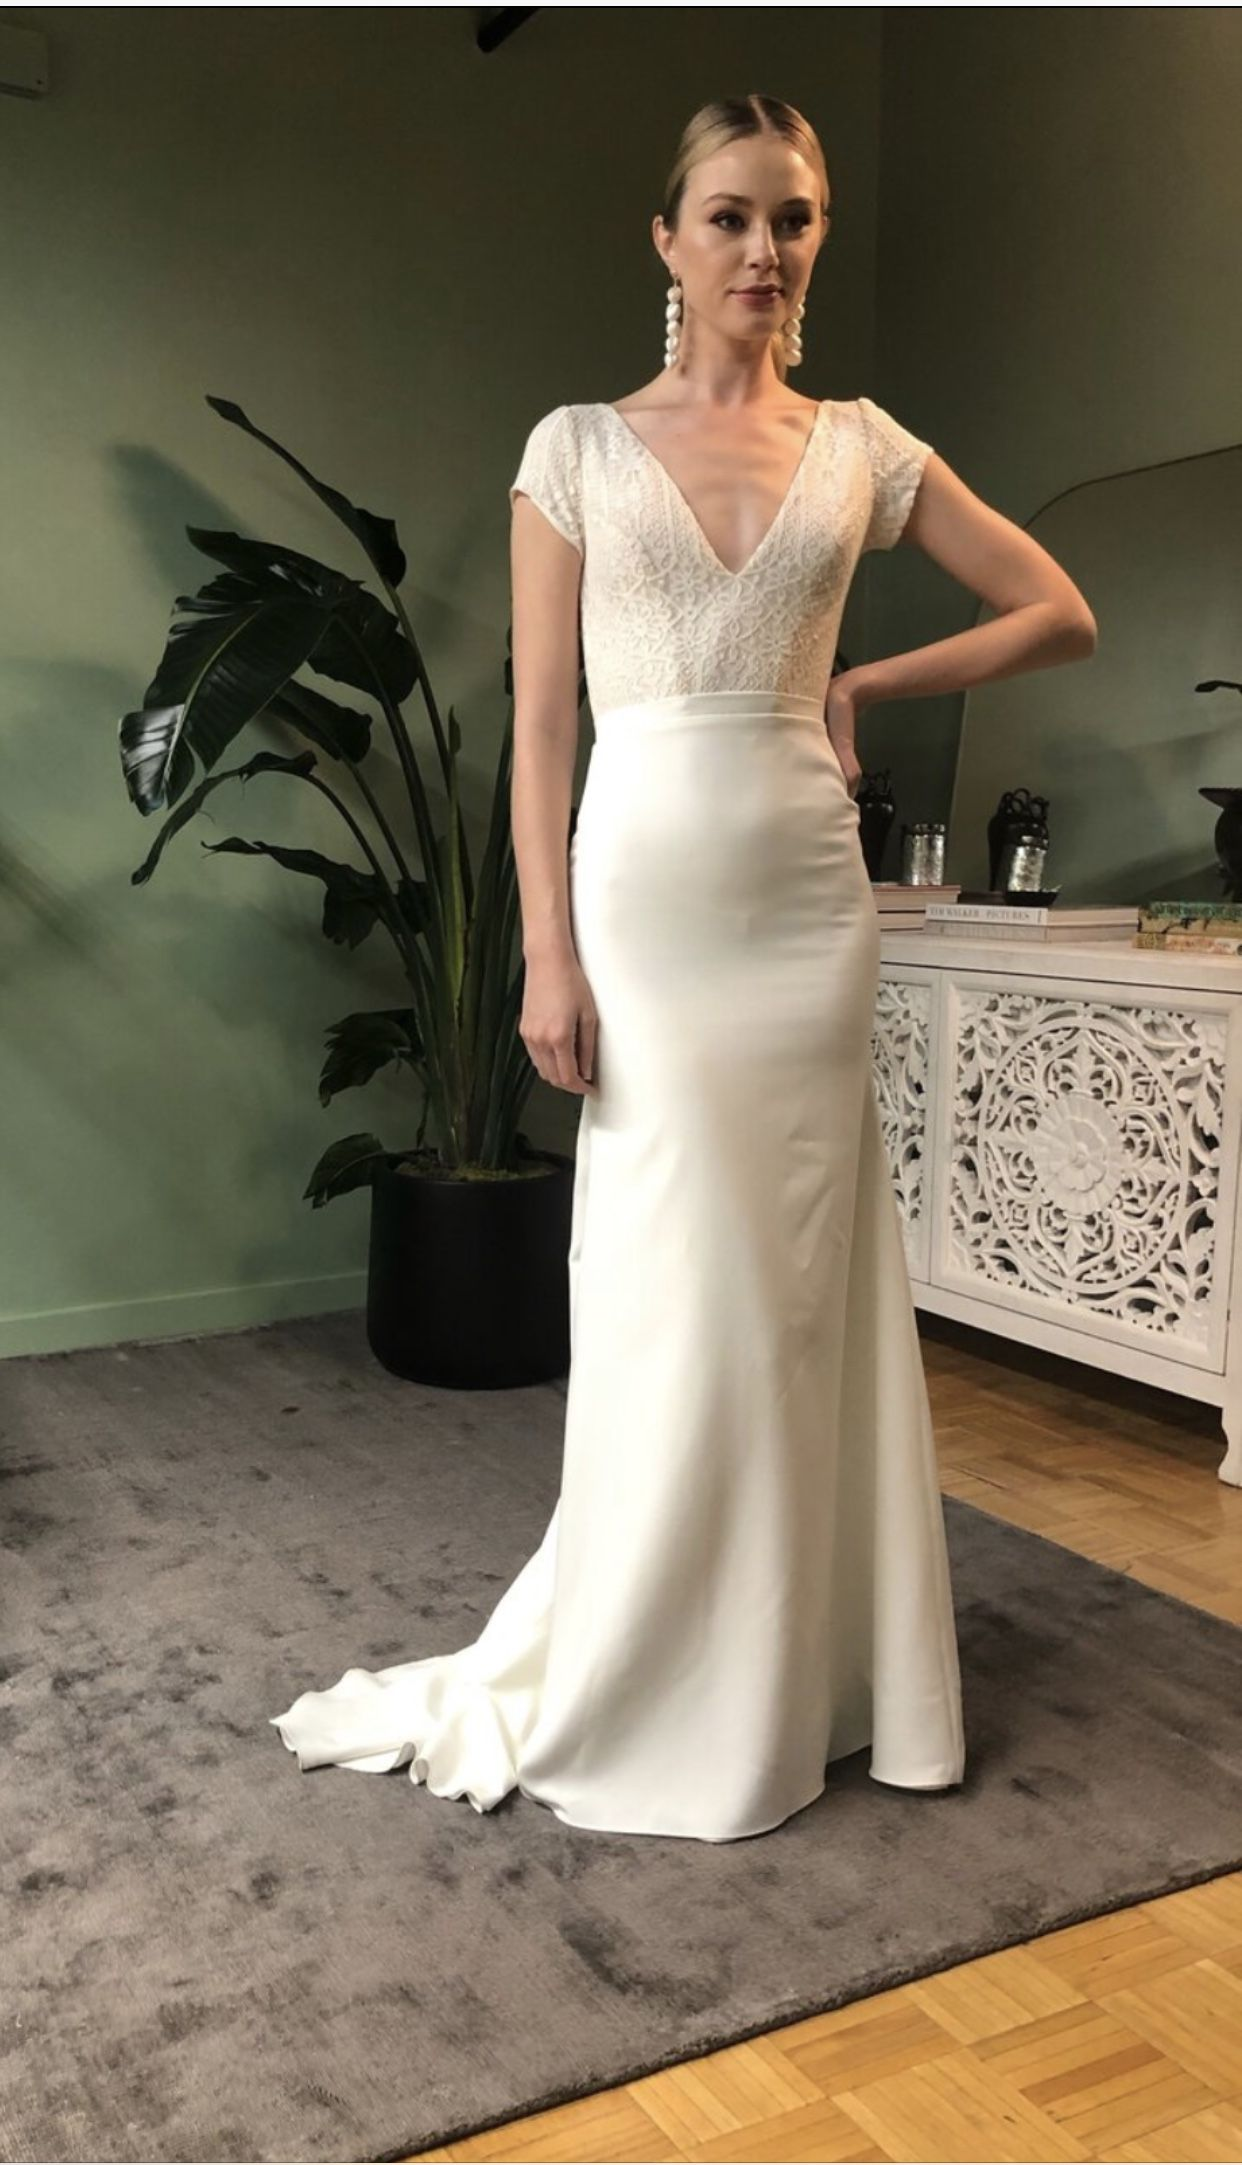 Pin By Elizabeth Findlay Bridal On Bridal Sample Consignment Dresses In 2020 Silk Wedding Dress Wedding Dress Styles Consignment Wedding Dresses